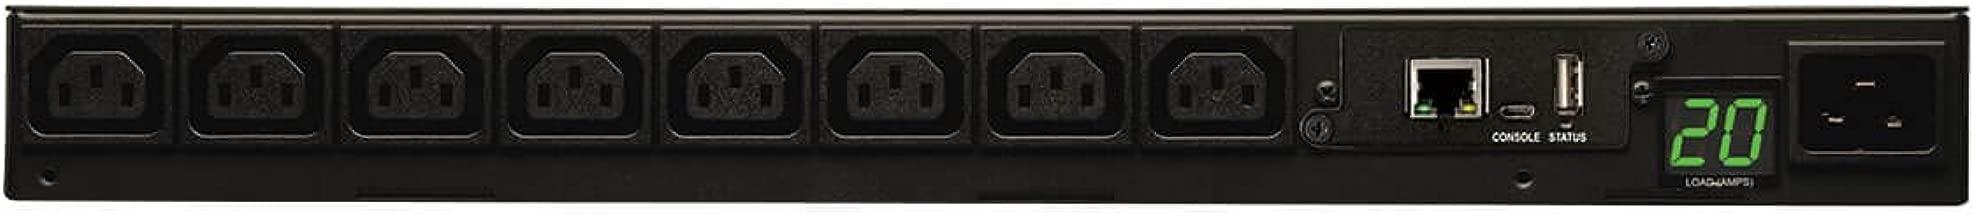 Tripp Lite Single Phase Monitored PDU, 20A, 8 Outlets C-13, 208/220/230/240V, C20/L6-20P Adapter, 8.5 ft. Cord, 1U Rack-Mount Power, LX Platform, TAA Compliant (PDUMNH20HV)